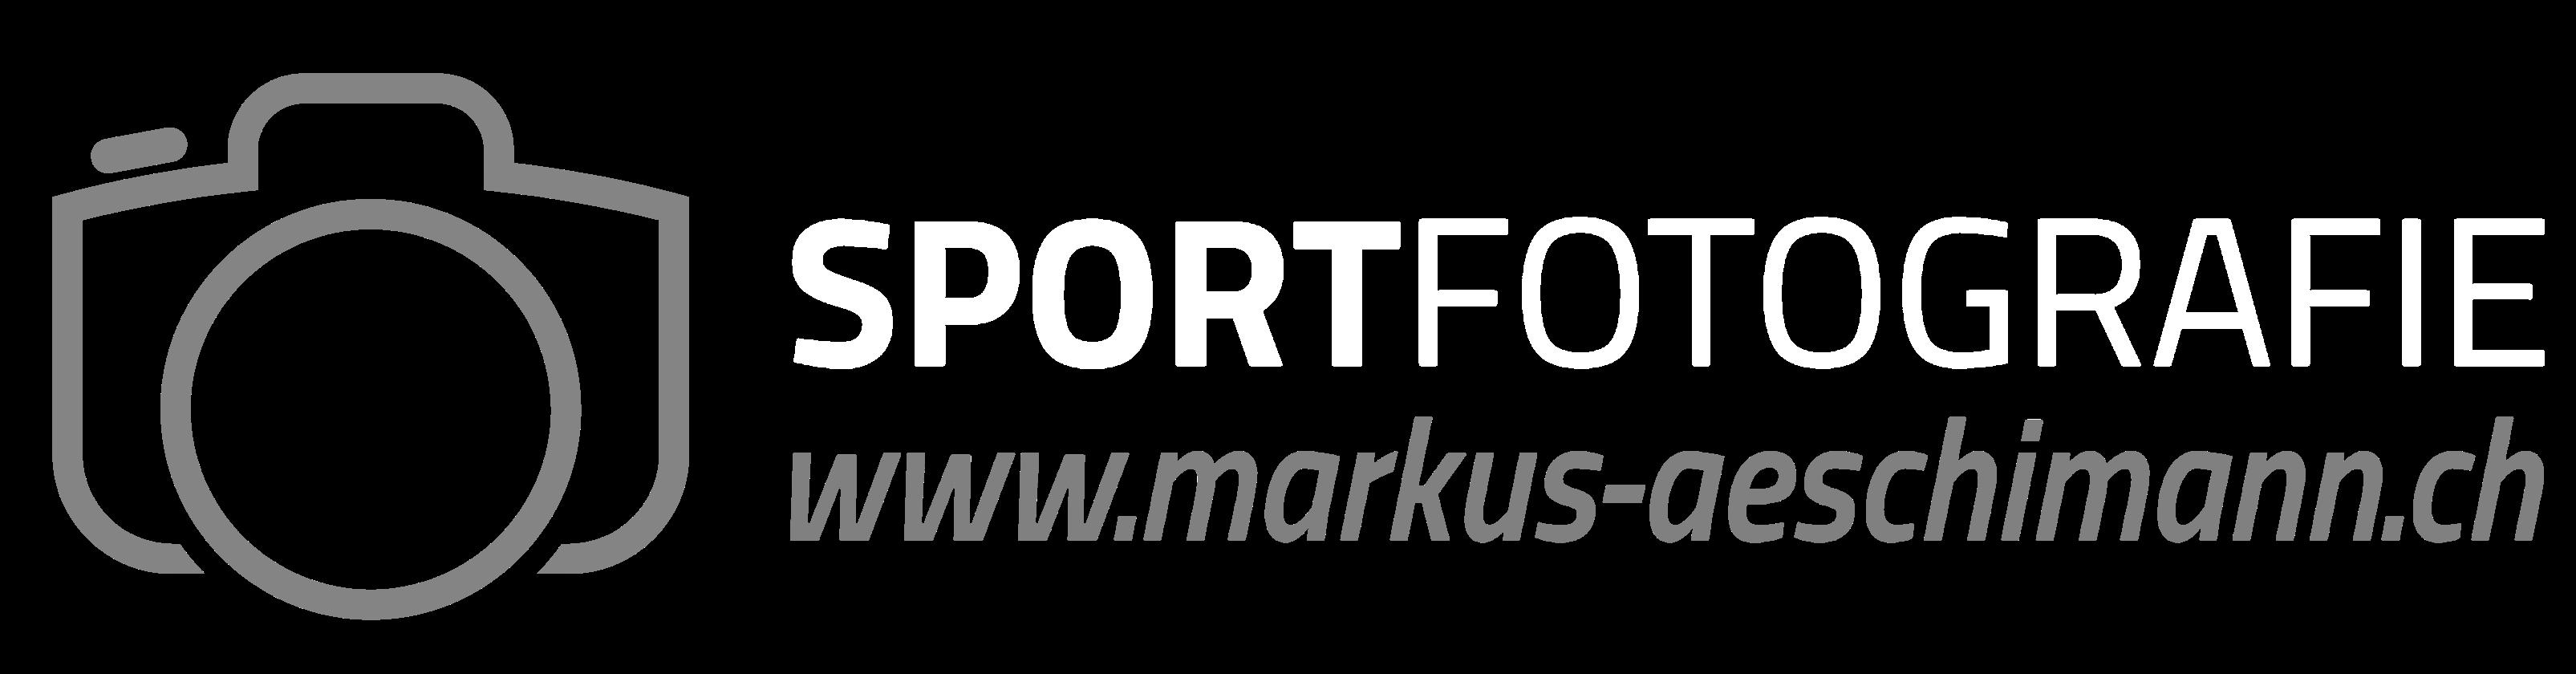 Sportfotografie Markus Aeschimann